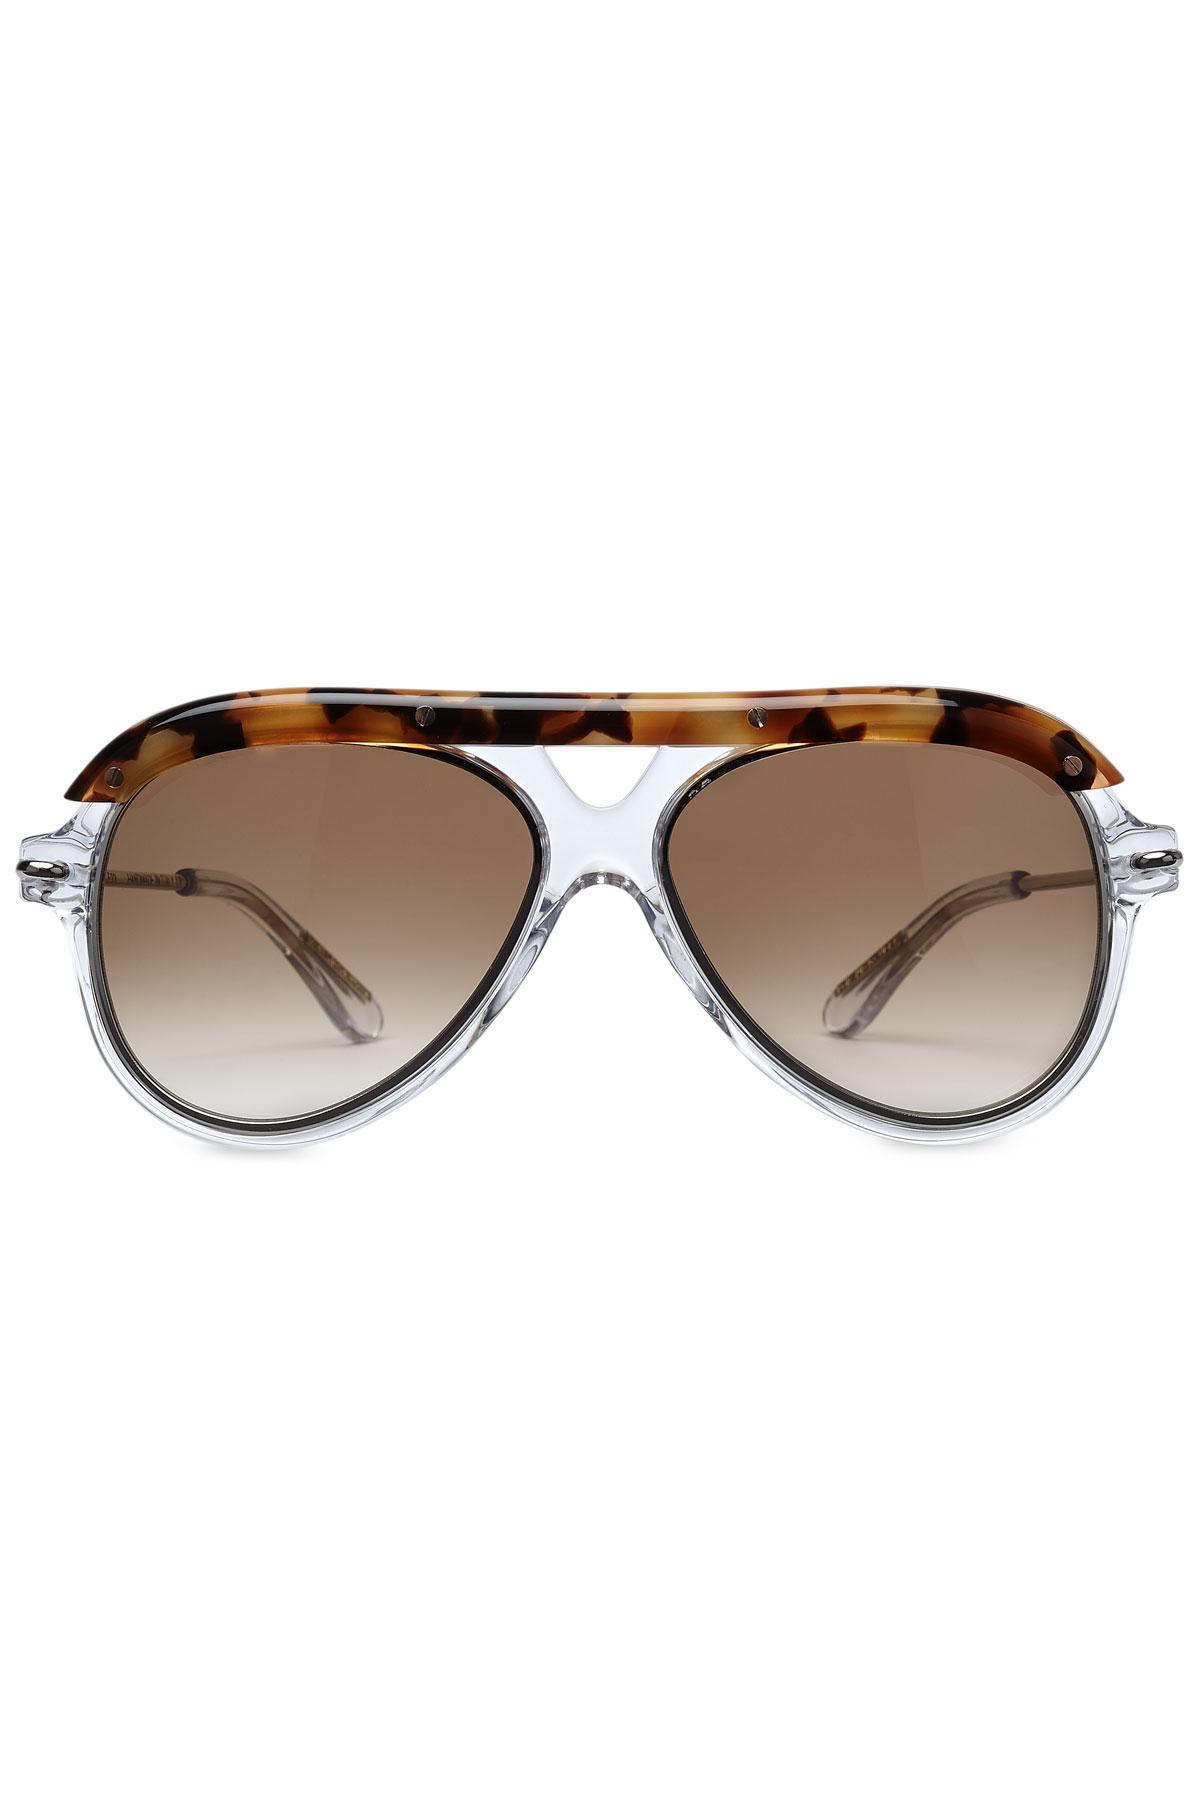 Roland Mouret Woman Round-frame Acetate Sunglasses Leaf Green Size Roland Mouret gMq2lFh